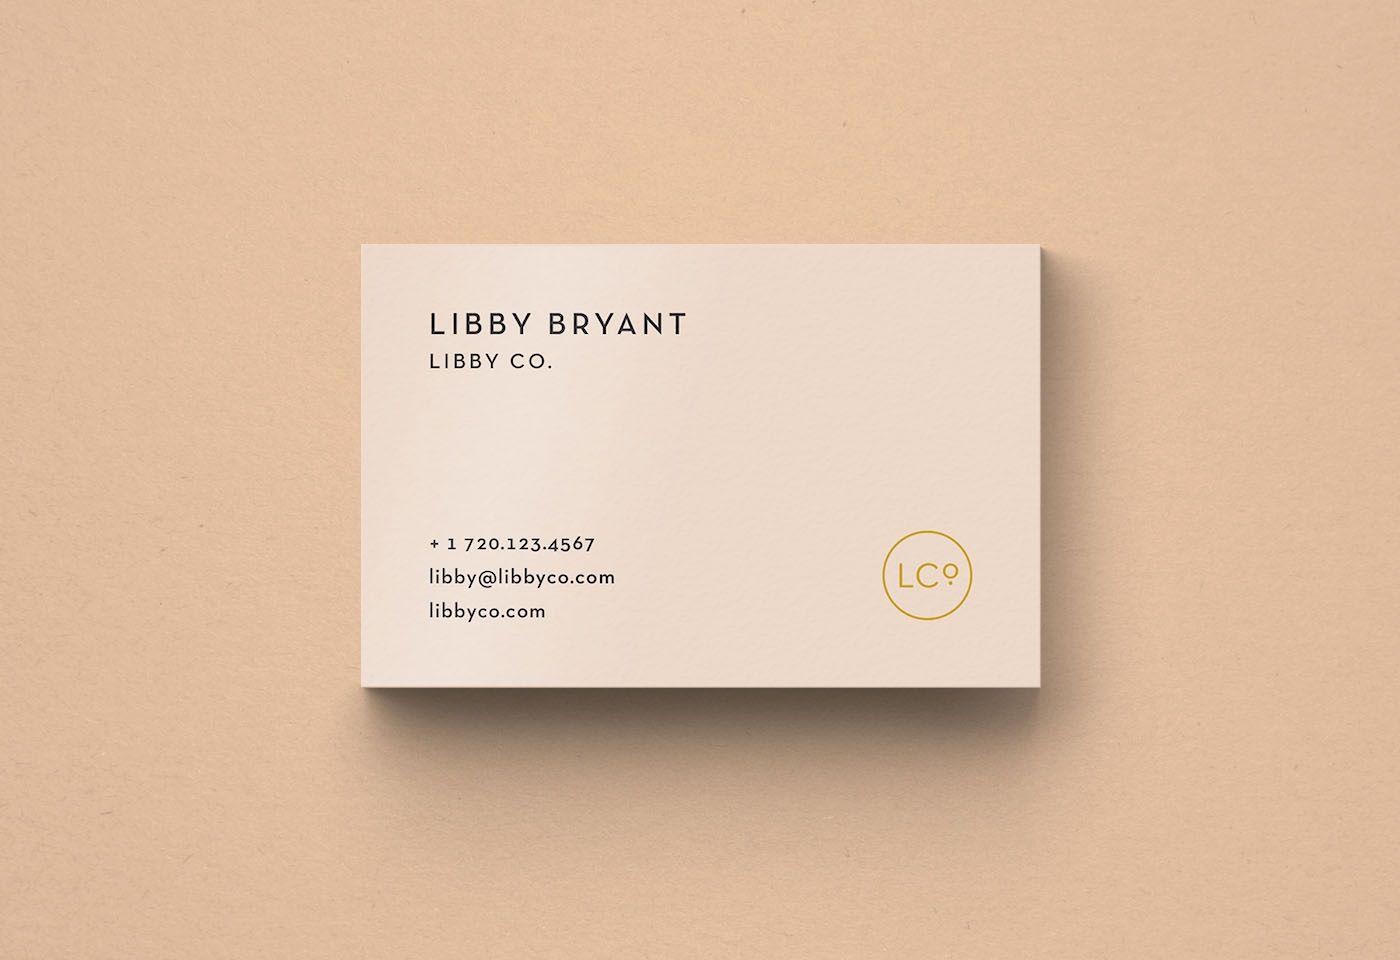 000 Best Minimalist Busines Card Template Psd Free Inspiration Full